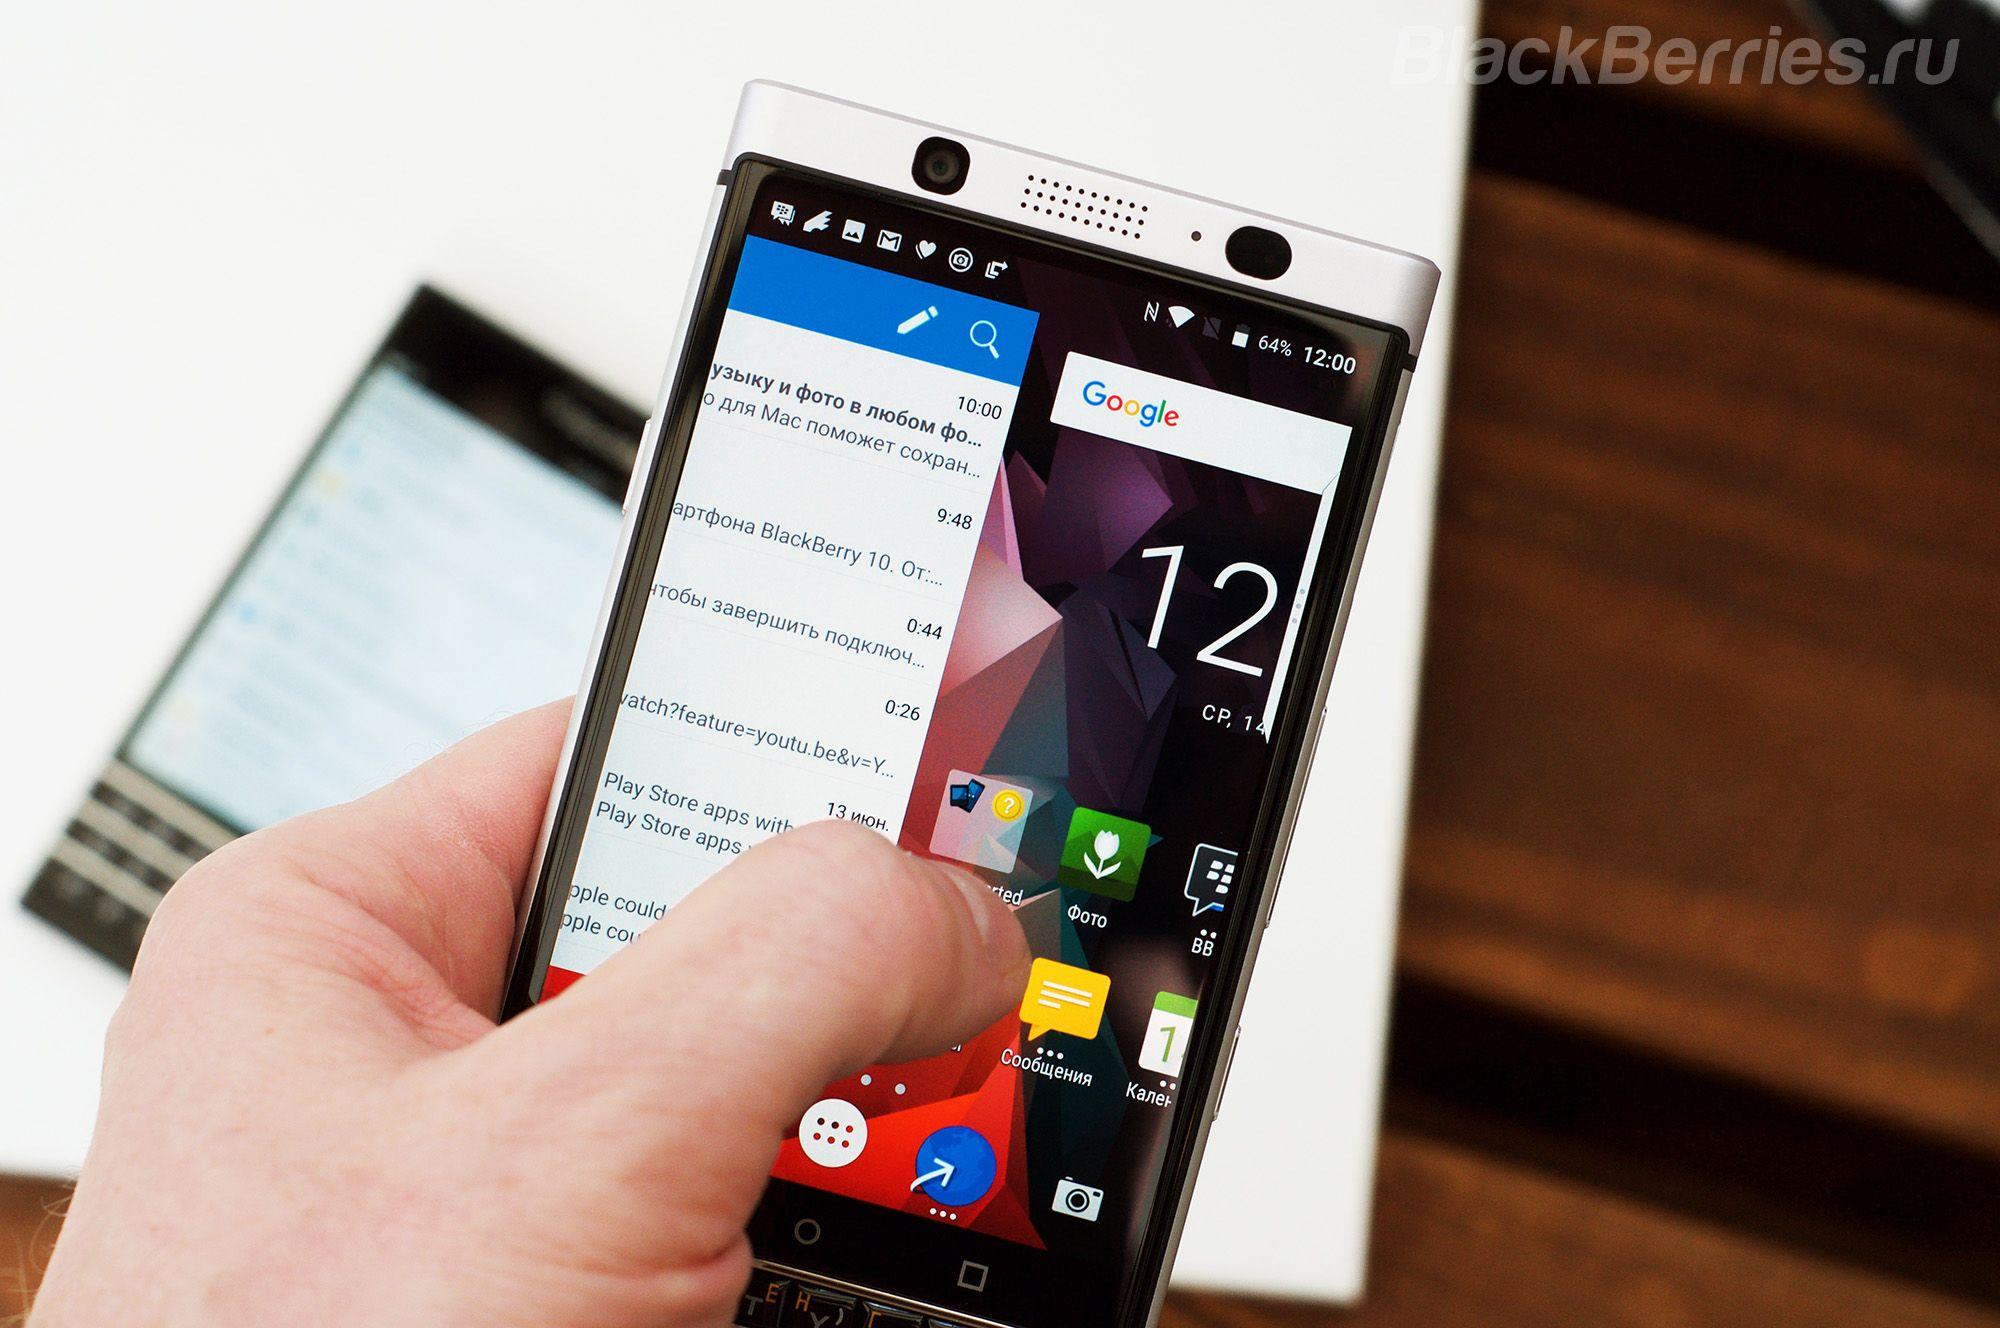 Приложение Icon Pack 10 для Android стало доступно в